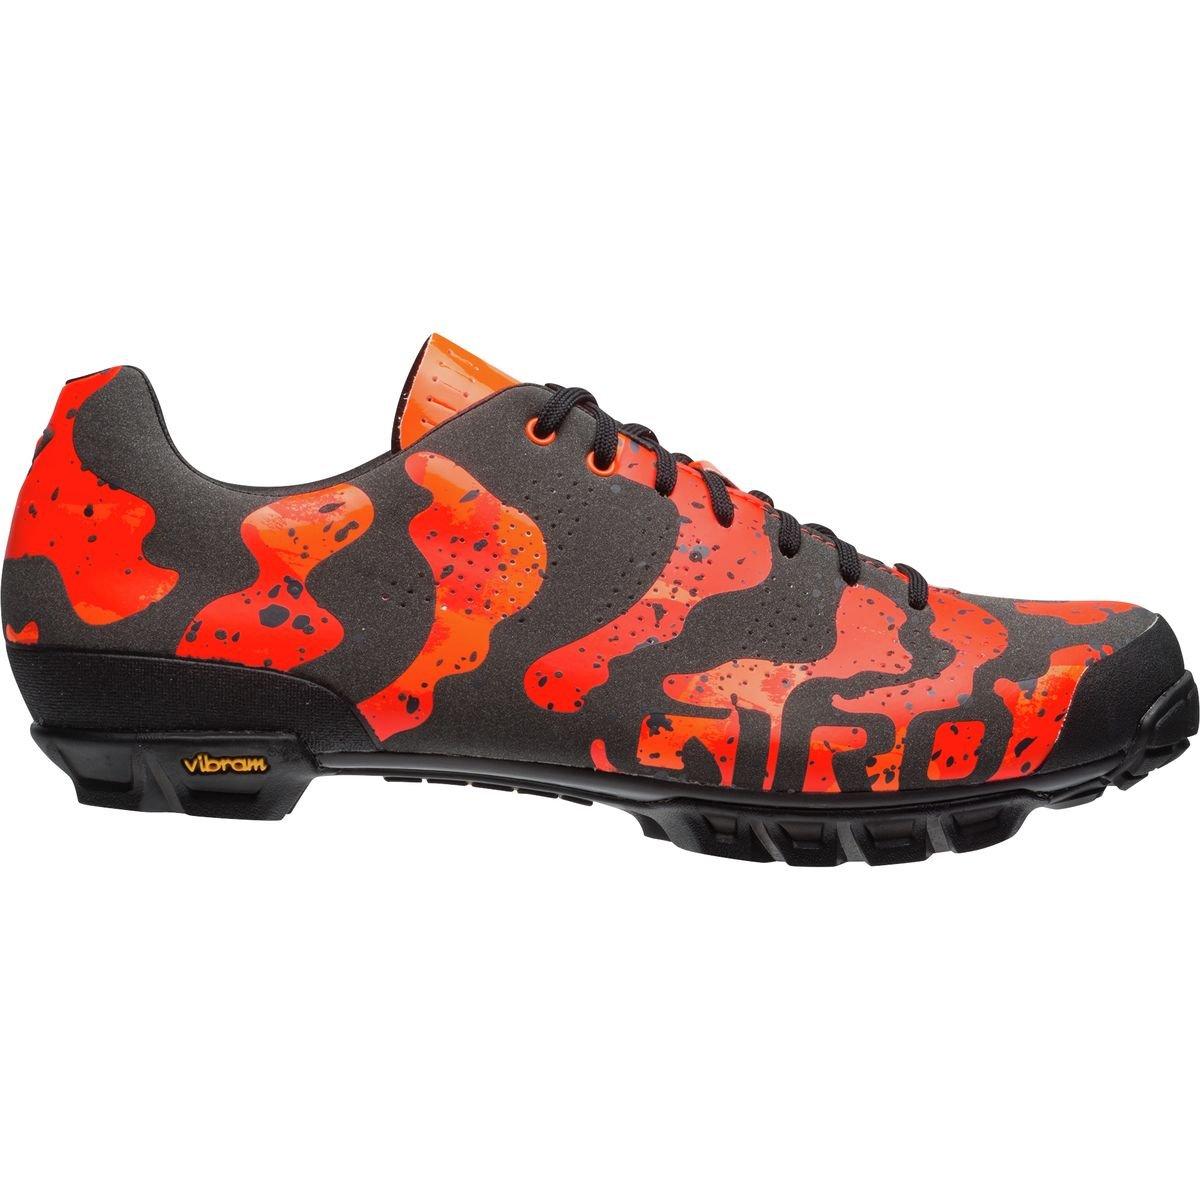 Giro Empire vr90 Limited Edition Camo Cycling Shoe – Men 's   B073R15LW3